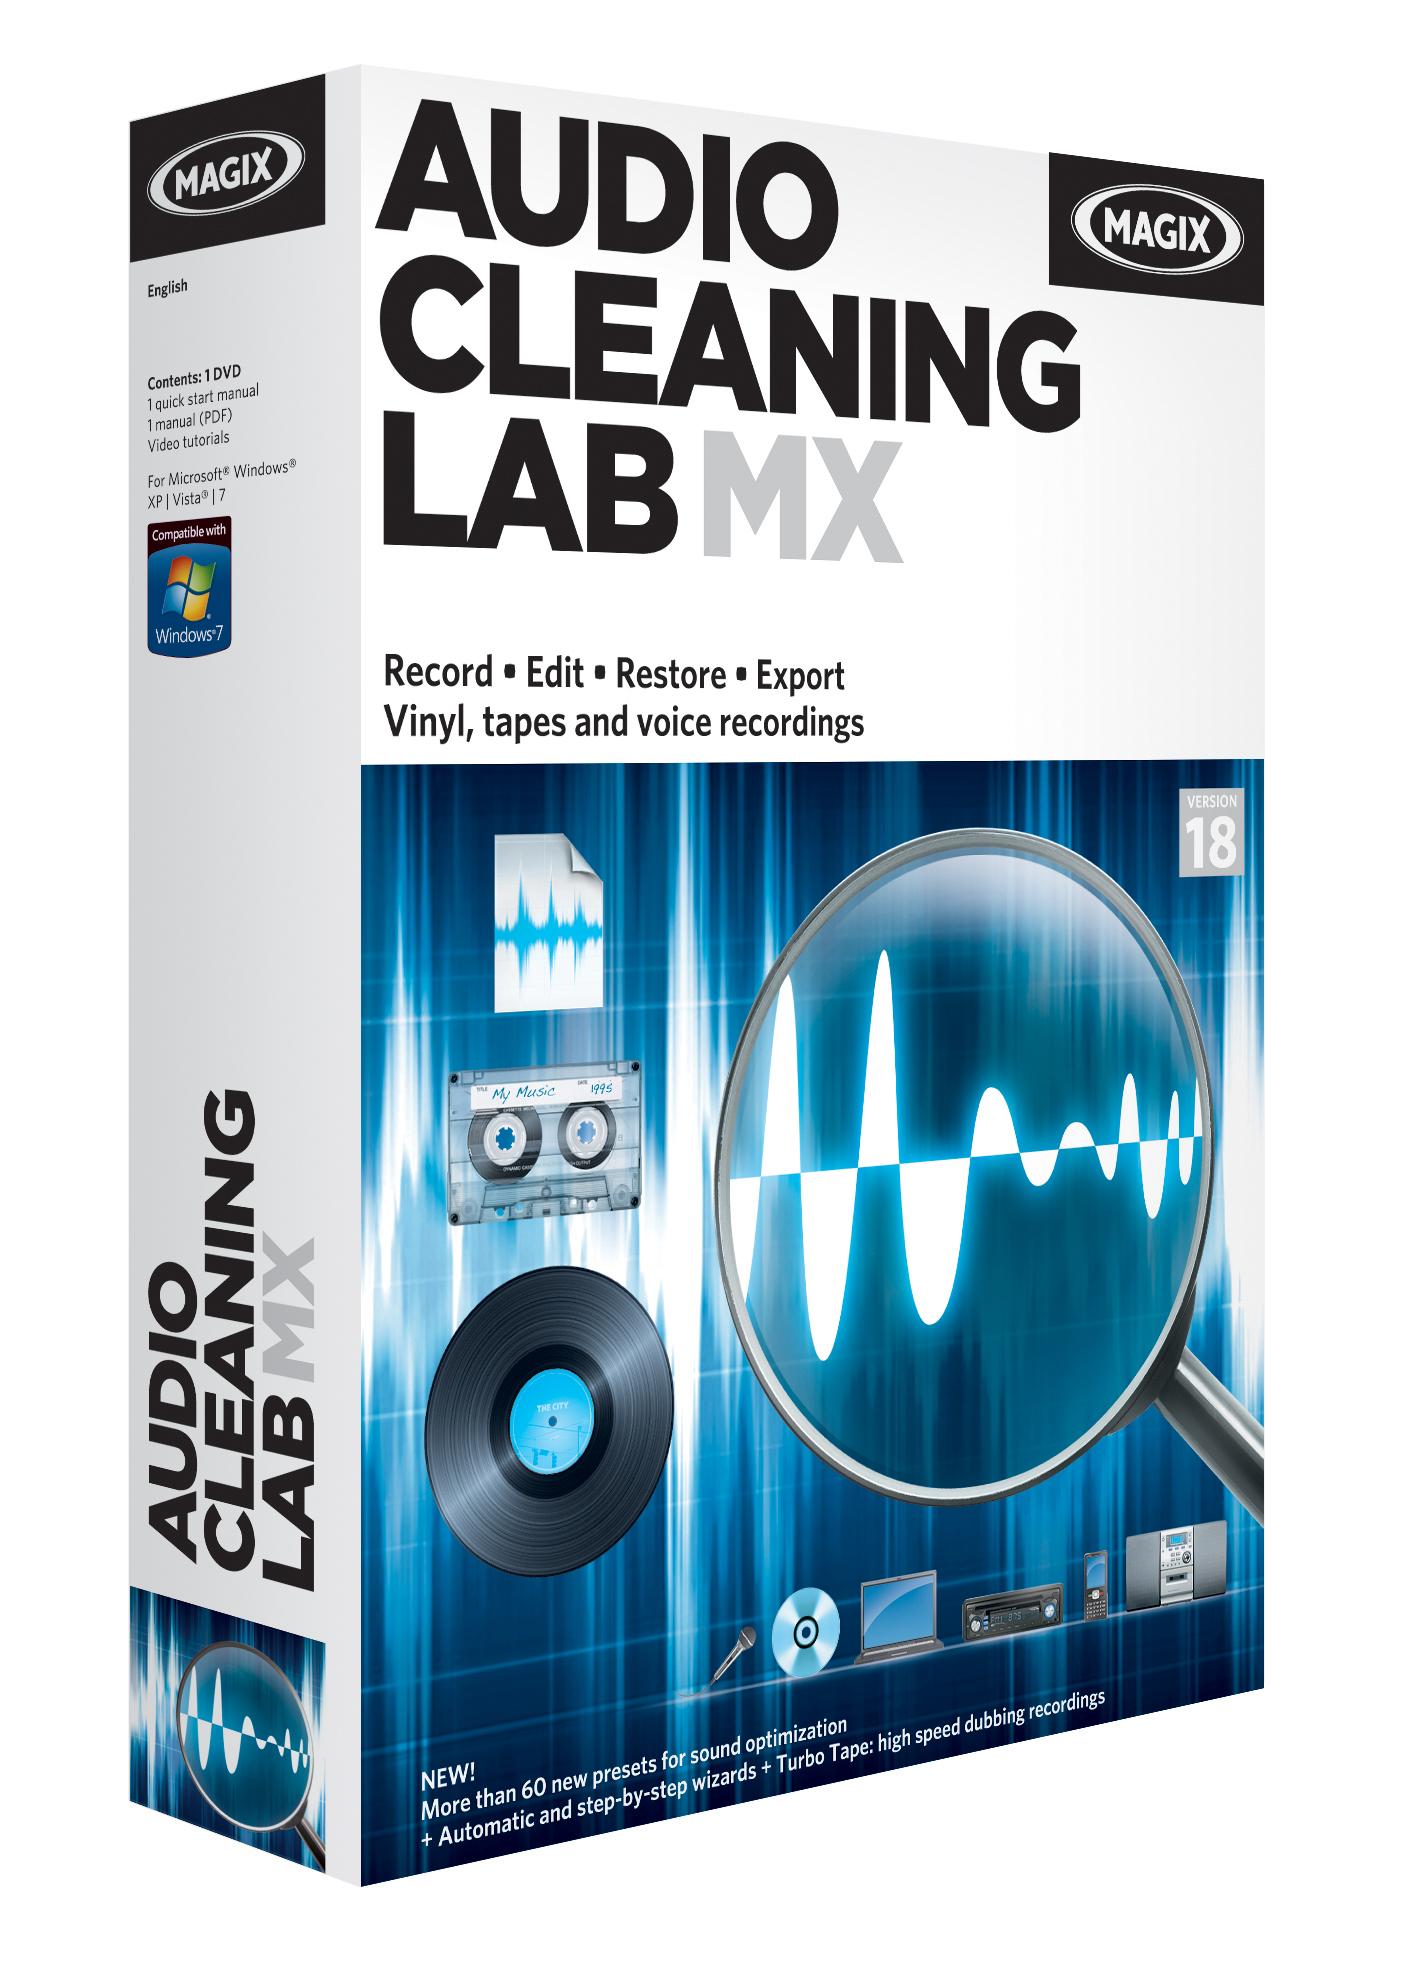 Professional audio editing and restoration: MAGIX Audio Cleaning Lab